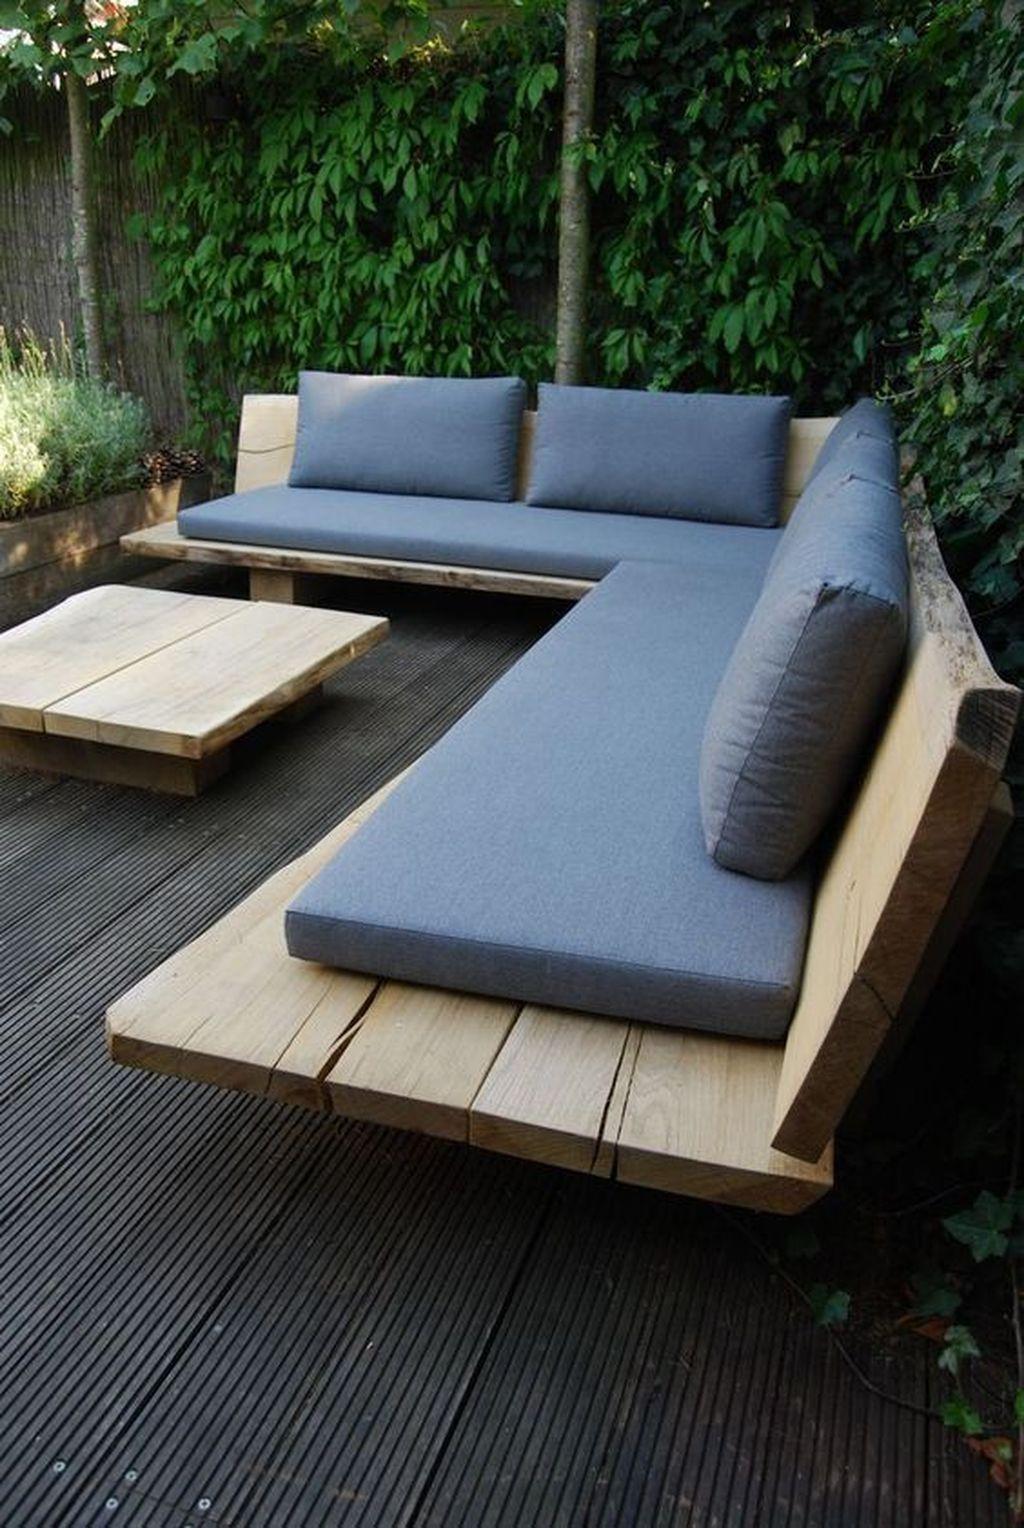 20 amazing cheap patio furniture ideas diy bench